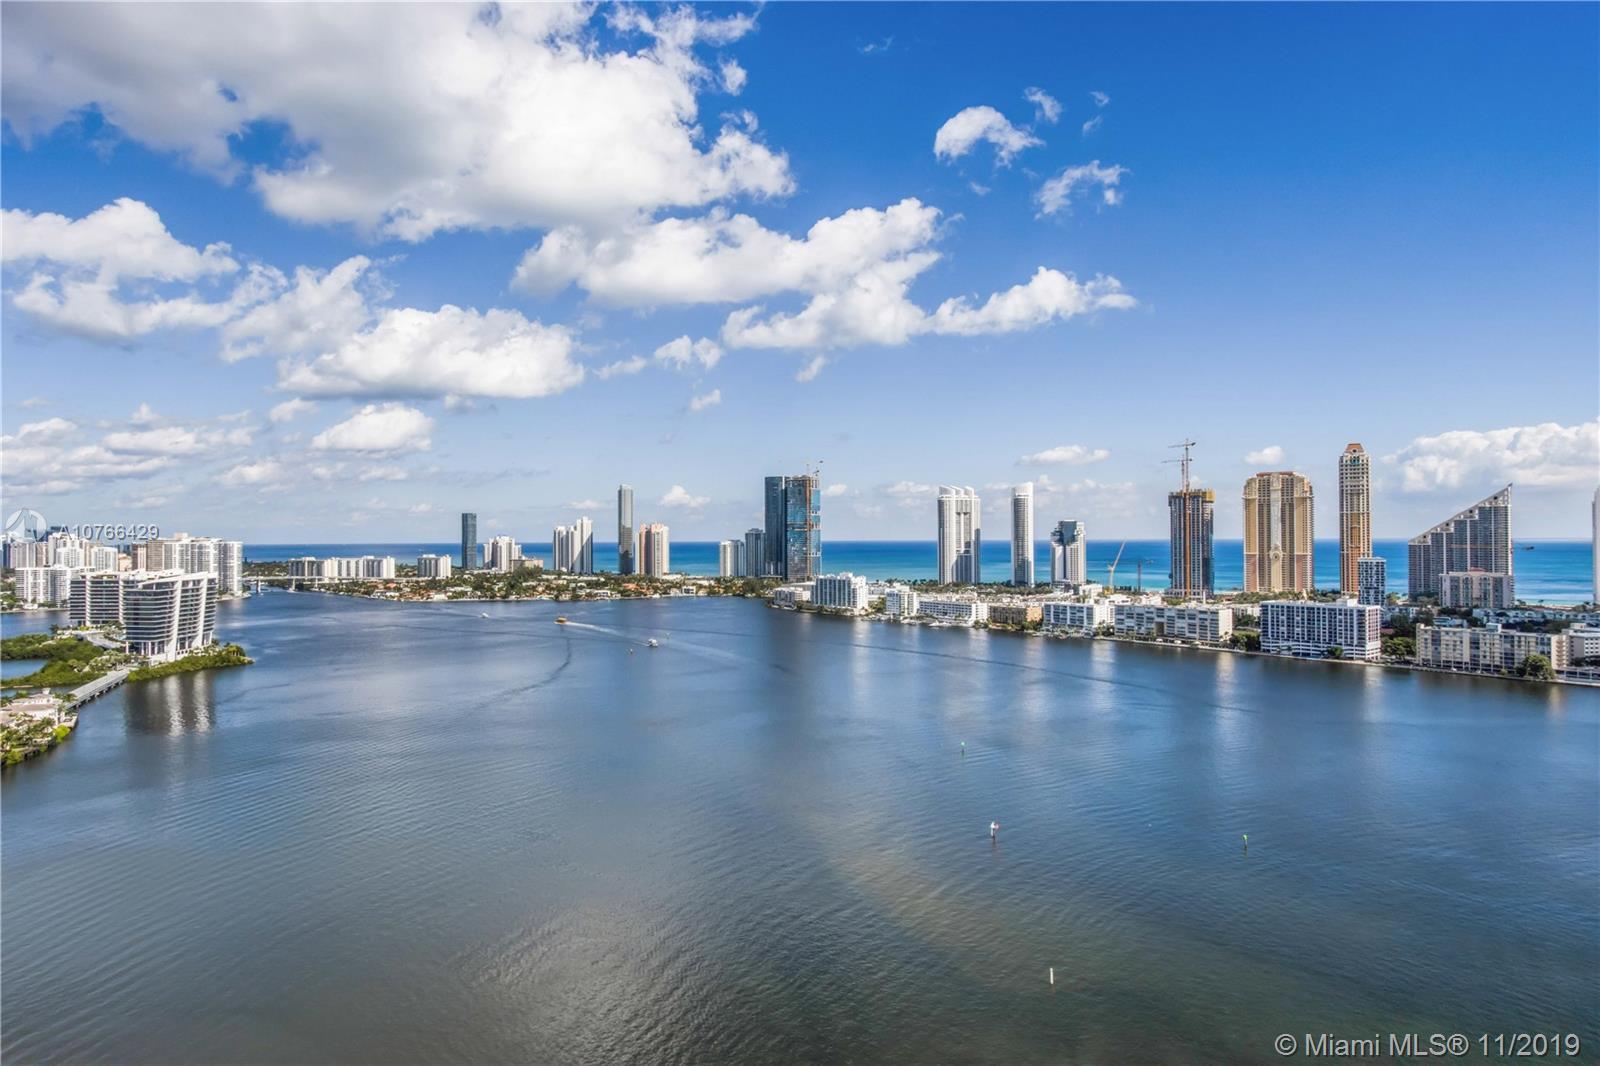 Аренда квартиры по адресу 2600 Island Blvd, Aventura, FL 33160 в США